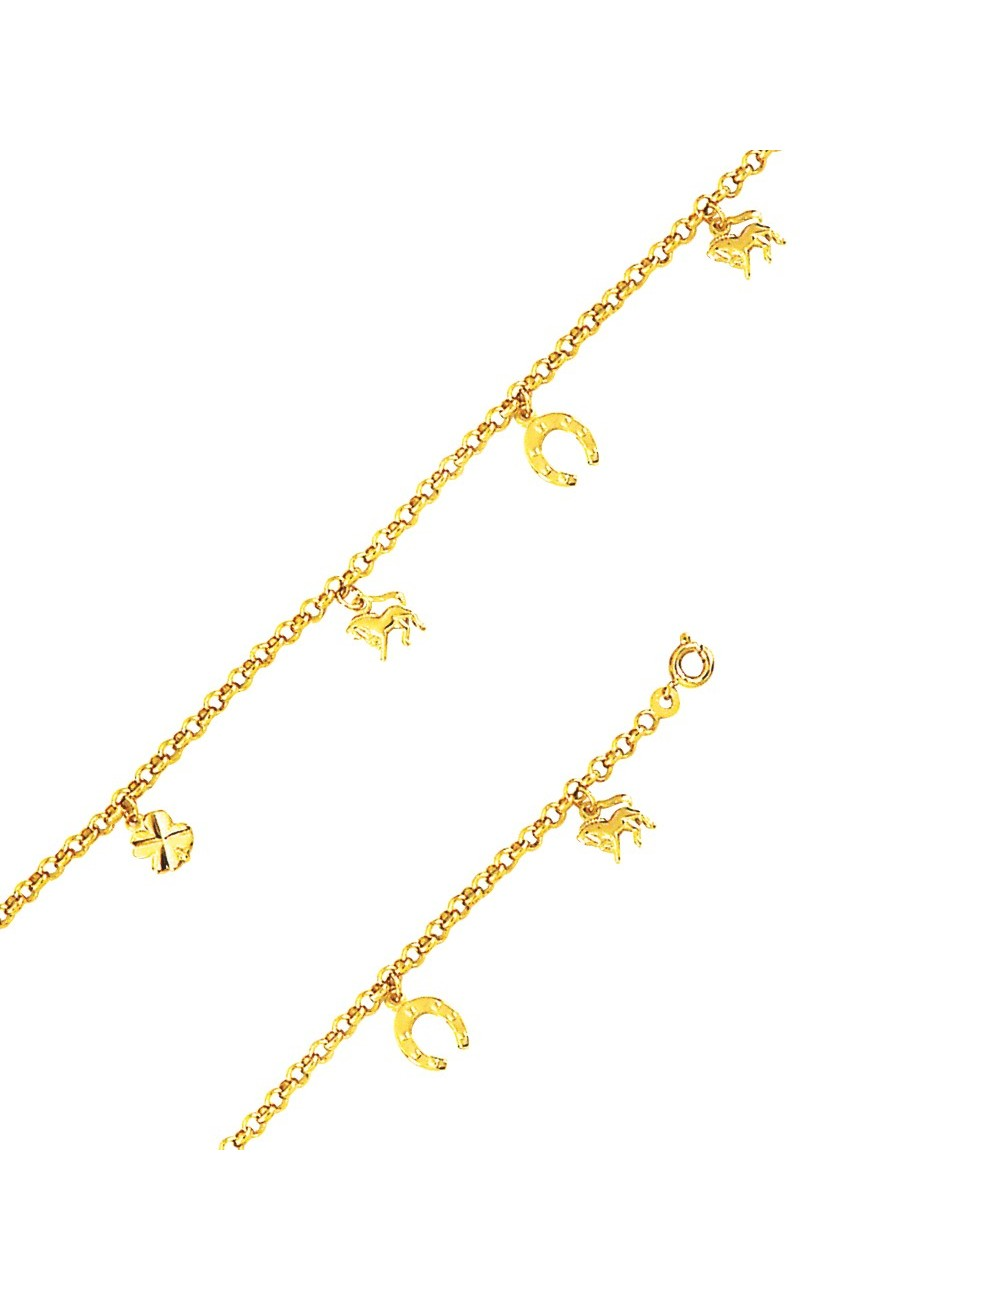 Bracelet plaqué or fer a cheval